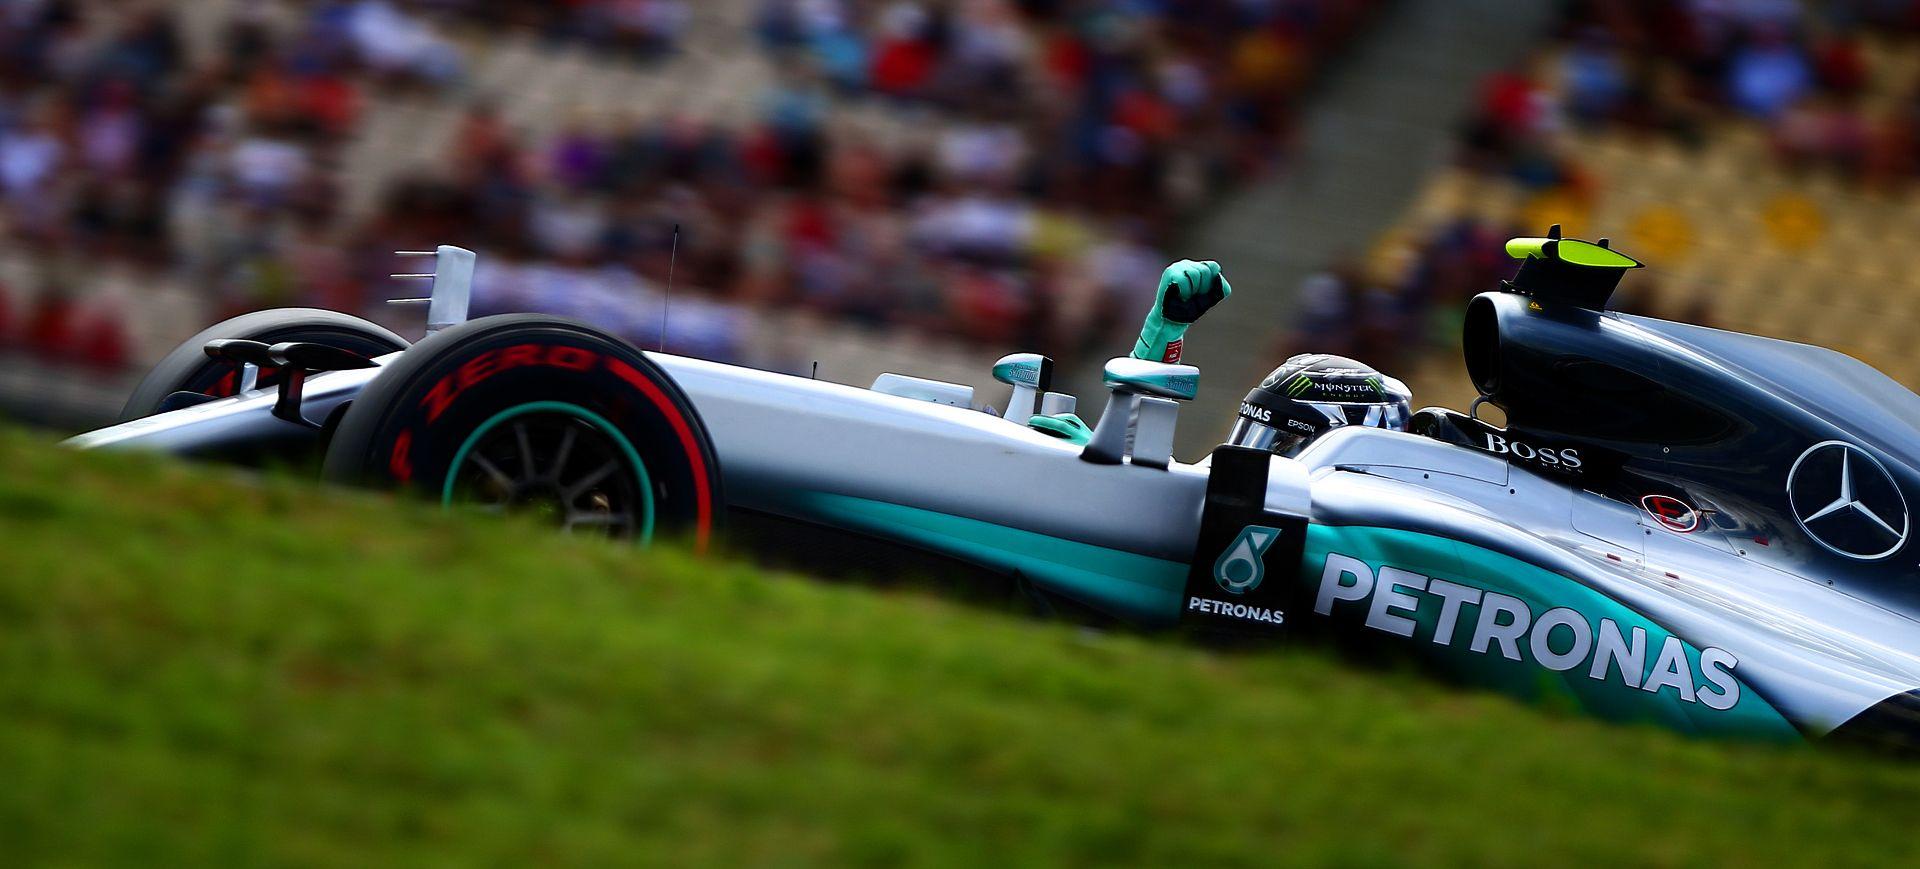 The German Grand Prix Is Kaput For 2017 German grand